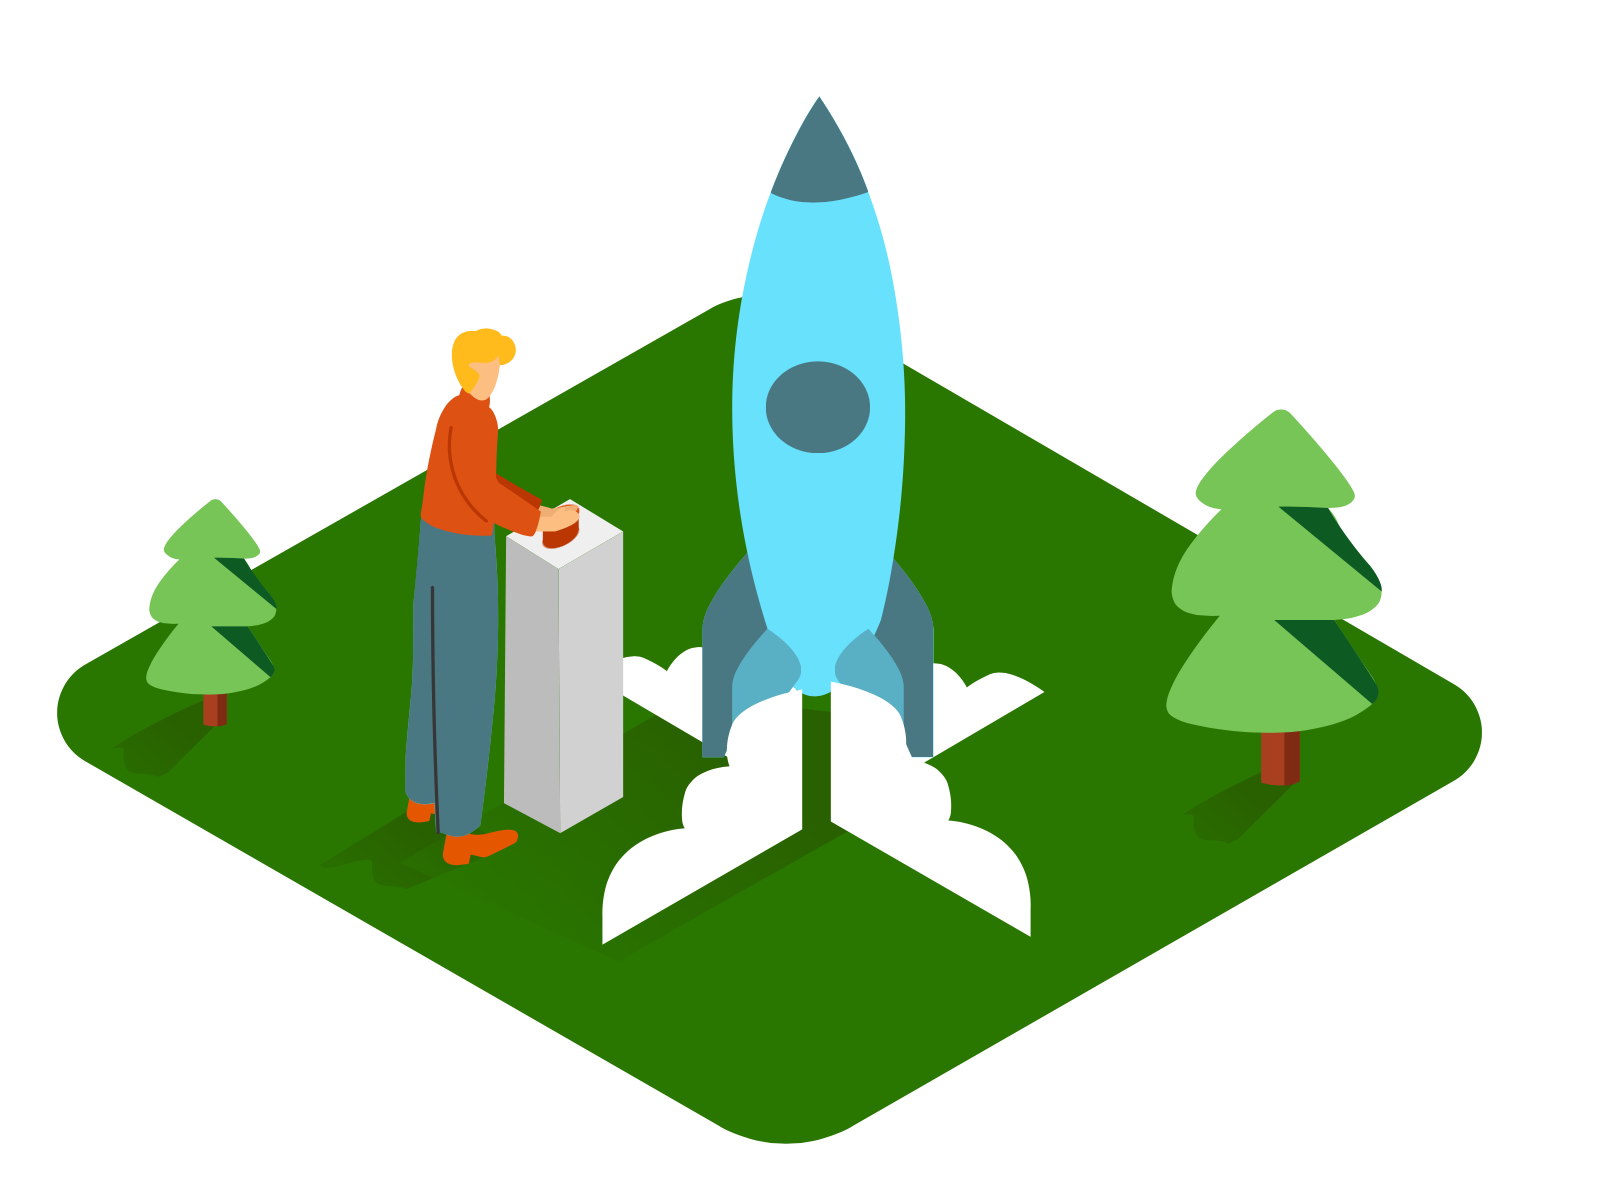 startup_isometric-2